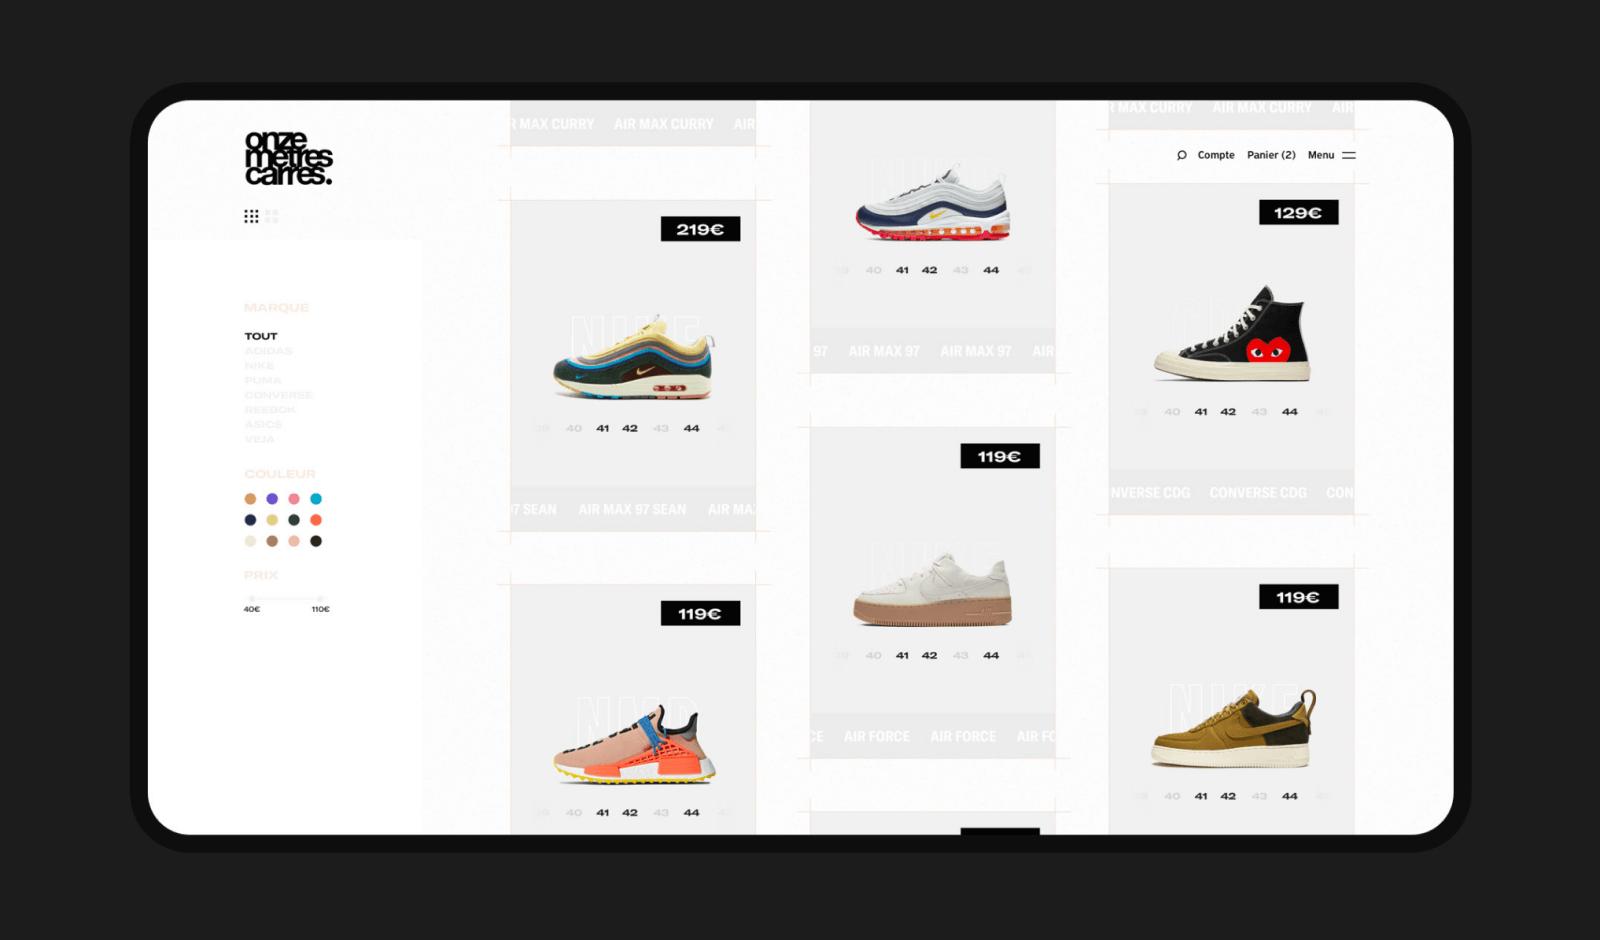 Onze Mètres Carrés - Webdesign